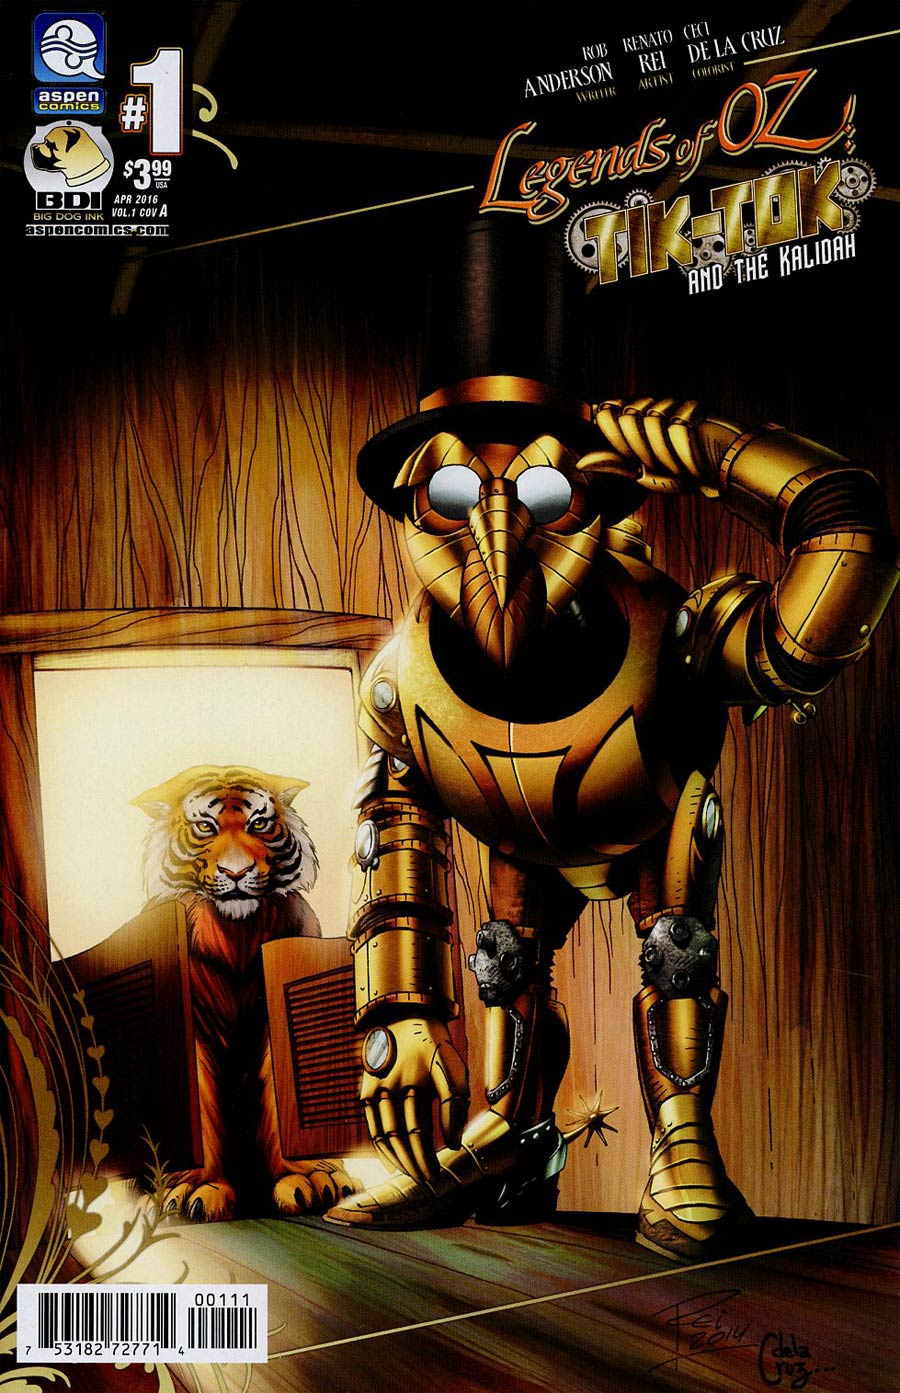 Legends Of Oz Tik-Tok And The Kalidah #1 Cover A Regular Renato Rei Cover